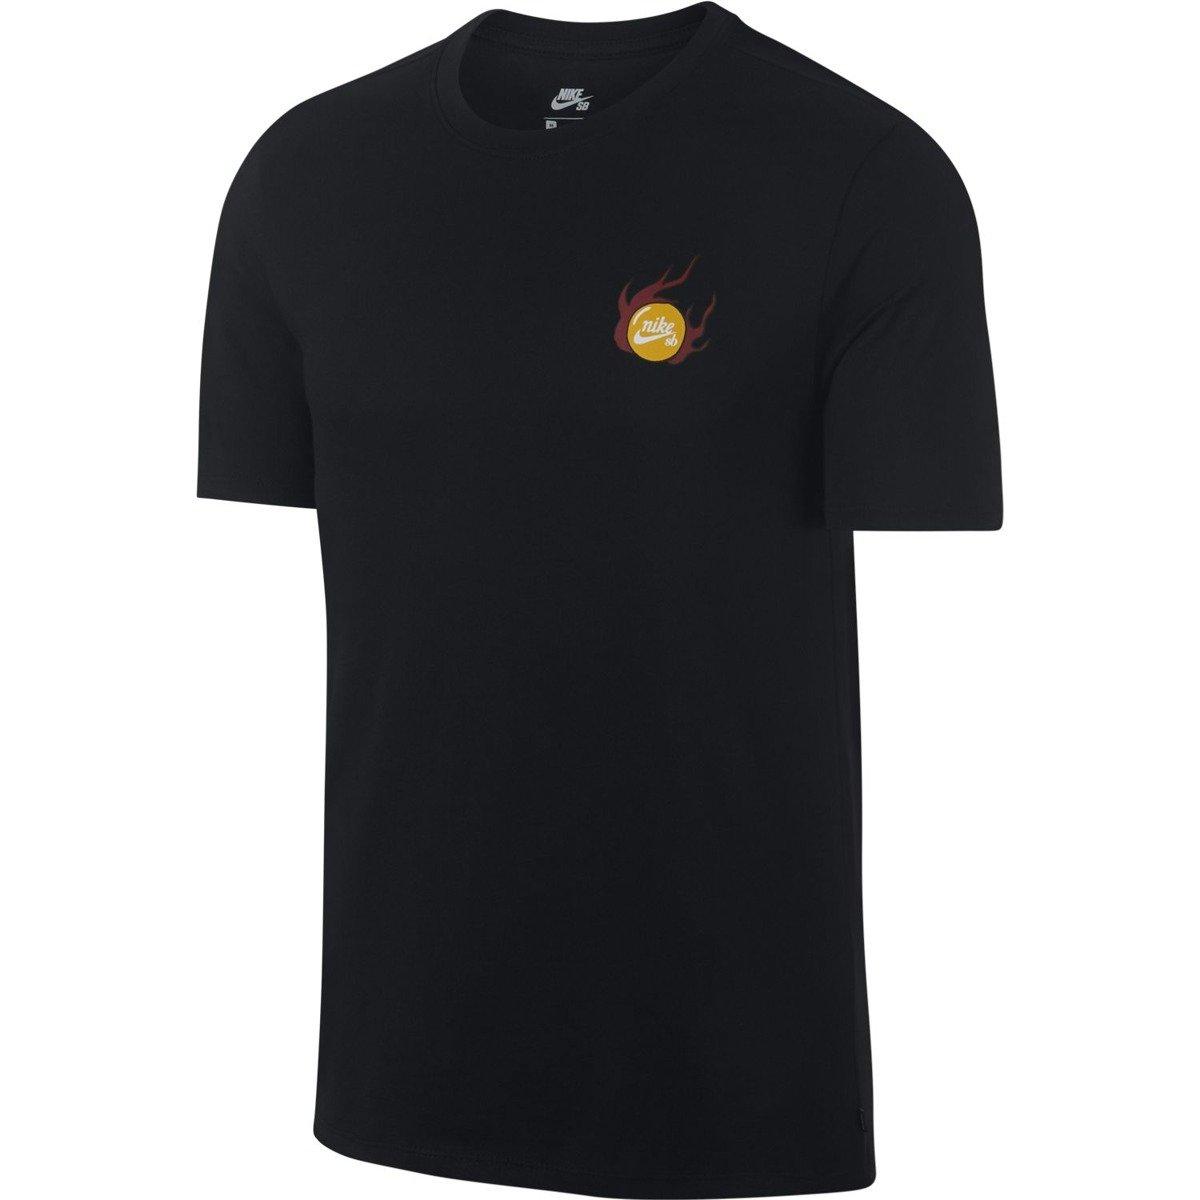 8a74d6f716547 Camiseta Masculina Nike Sb Dragon Manga Curta 923436-010 - Preto ...